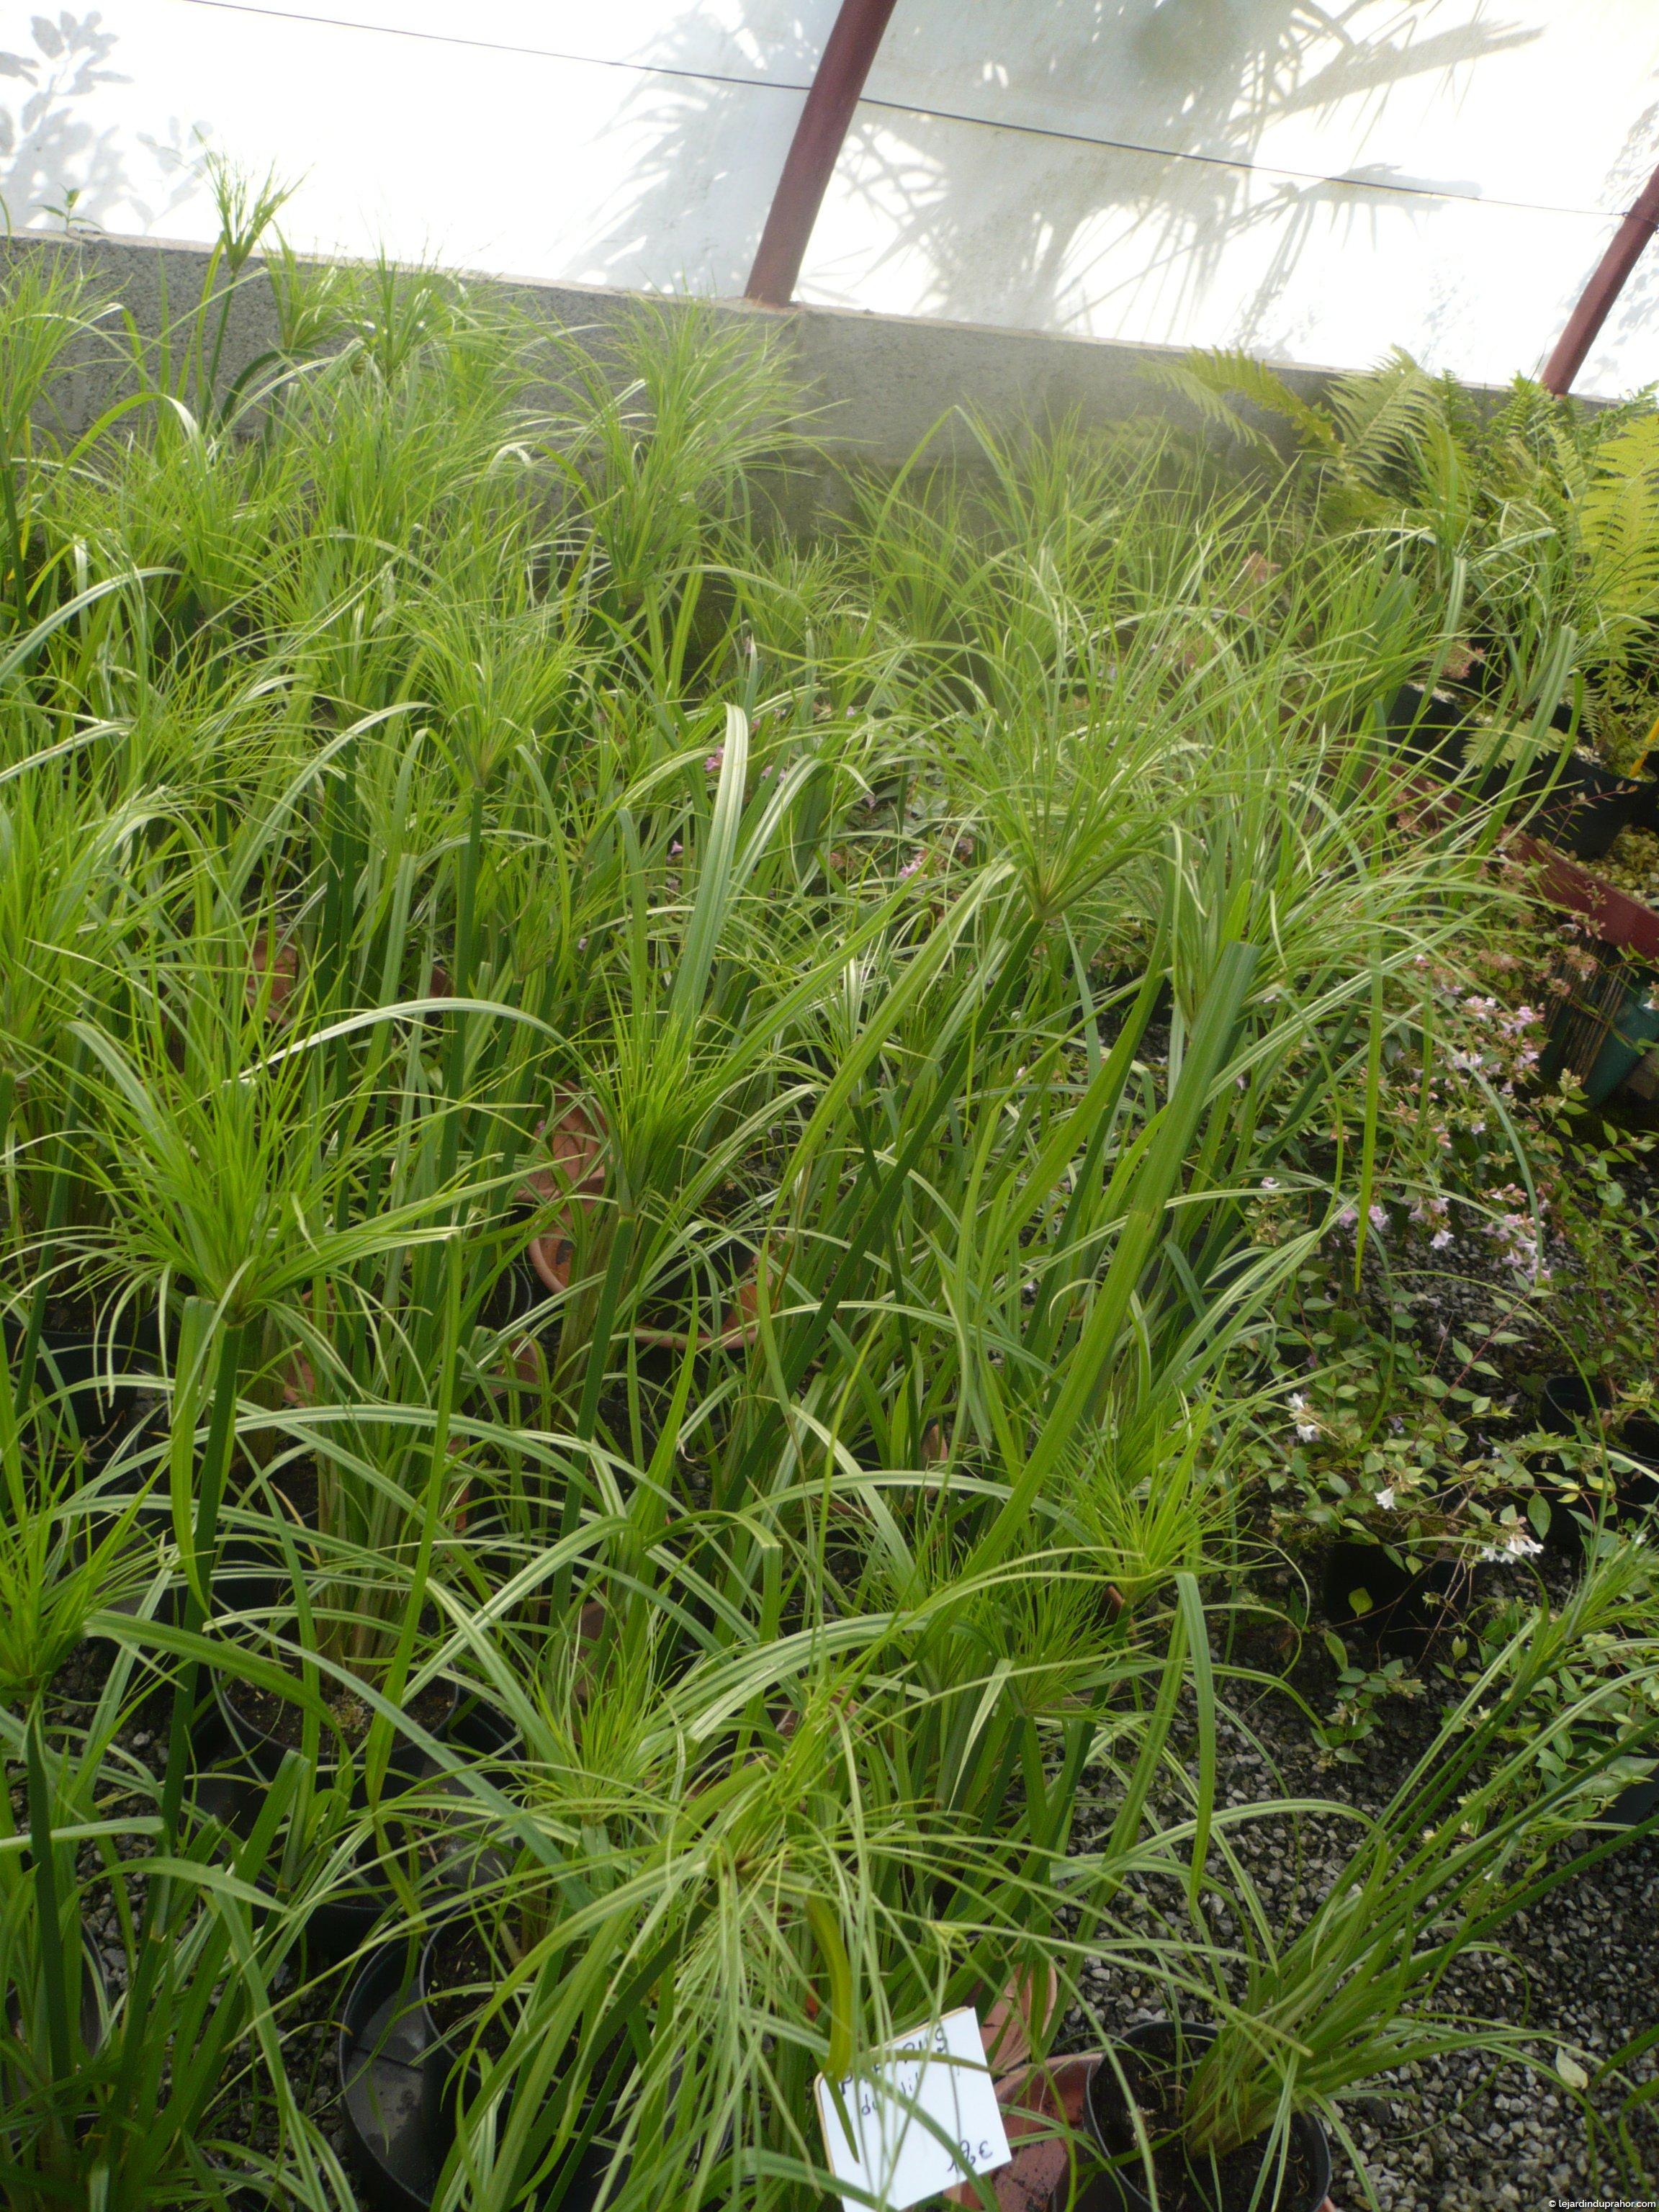 Cyperus papyrus le jardin du prahor for Jardin du nil red wine